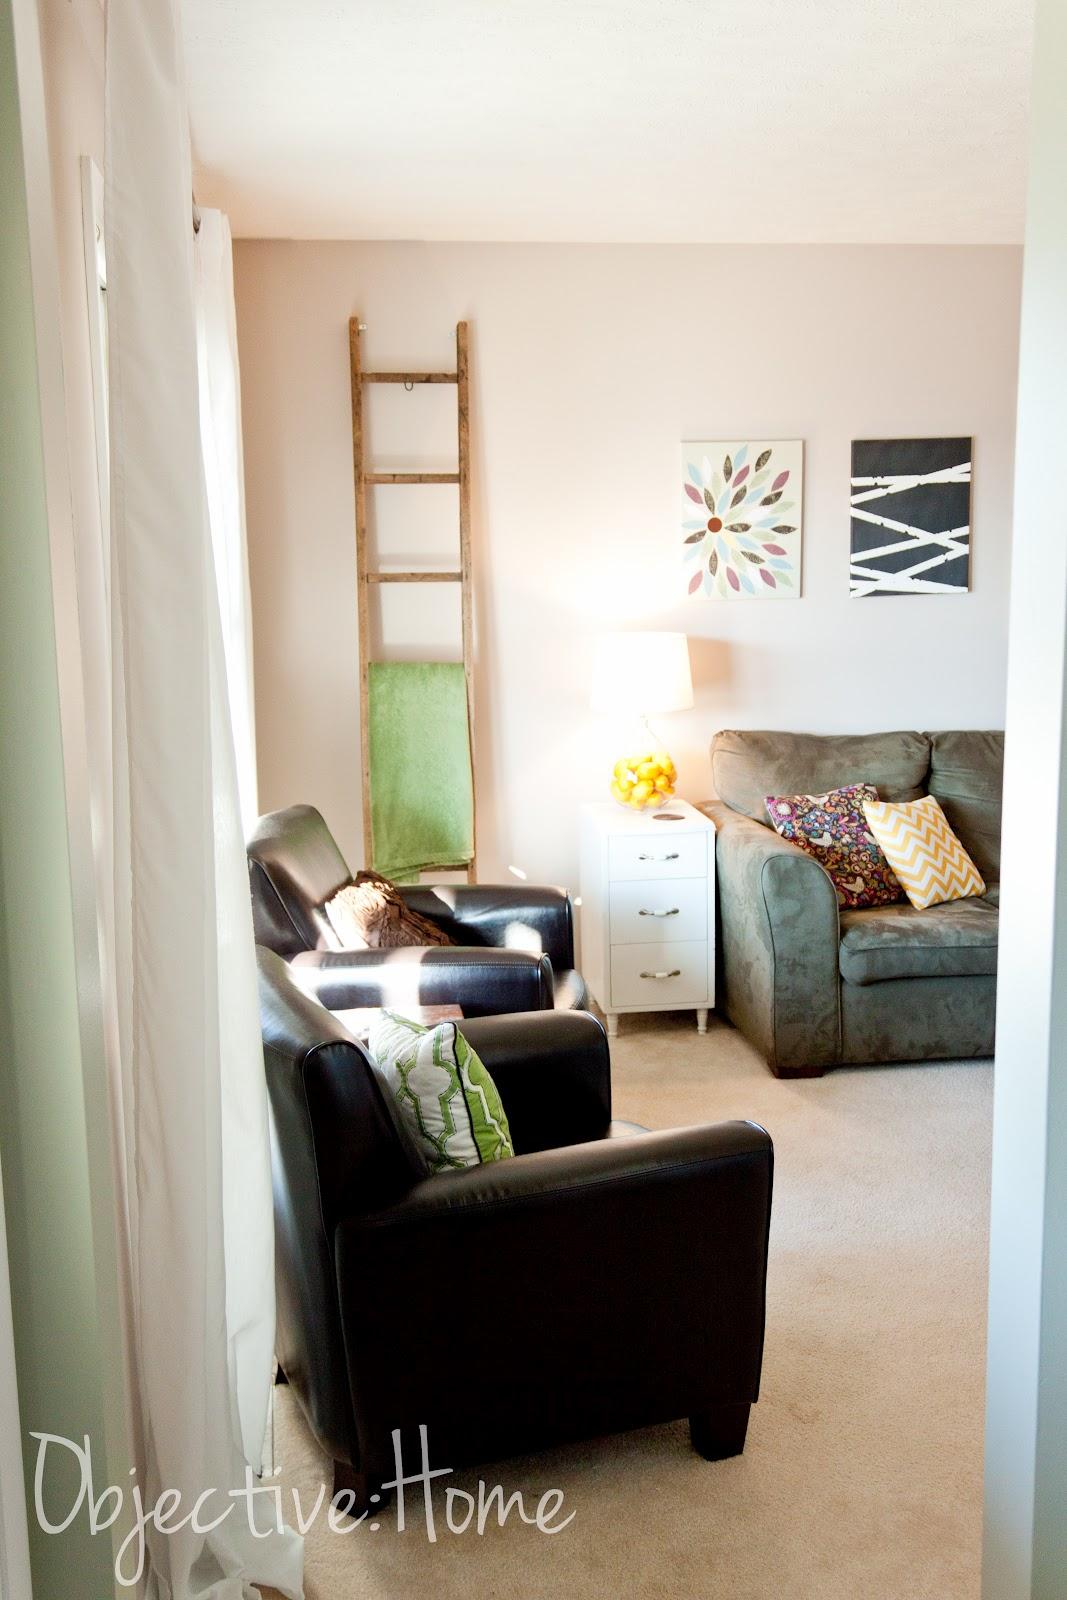 Objective Home Paint Colors